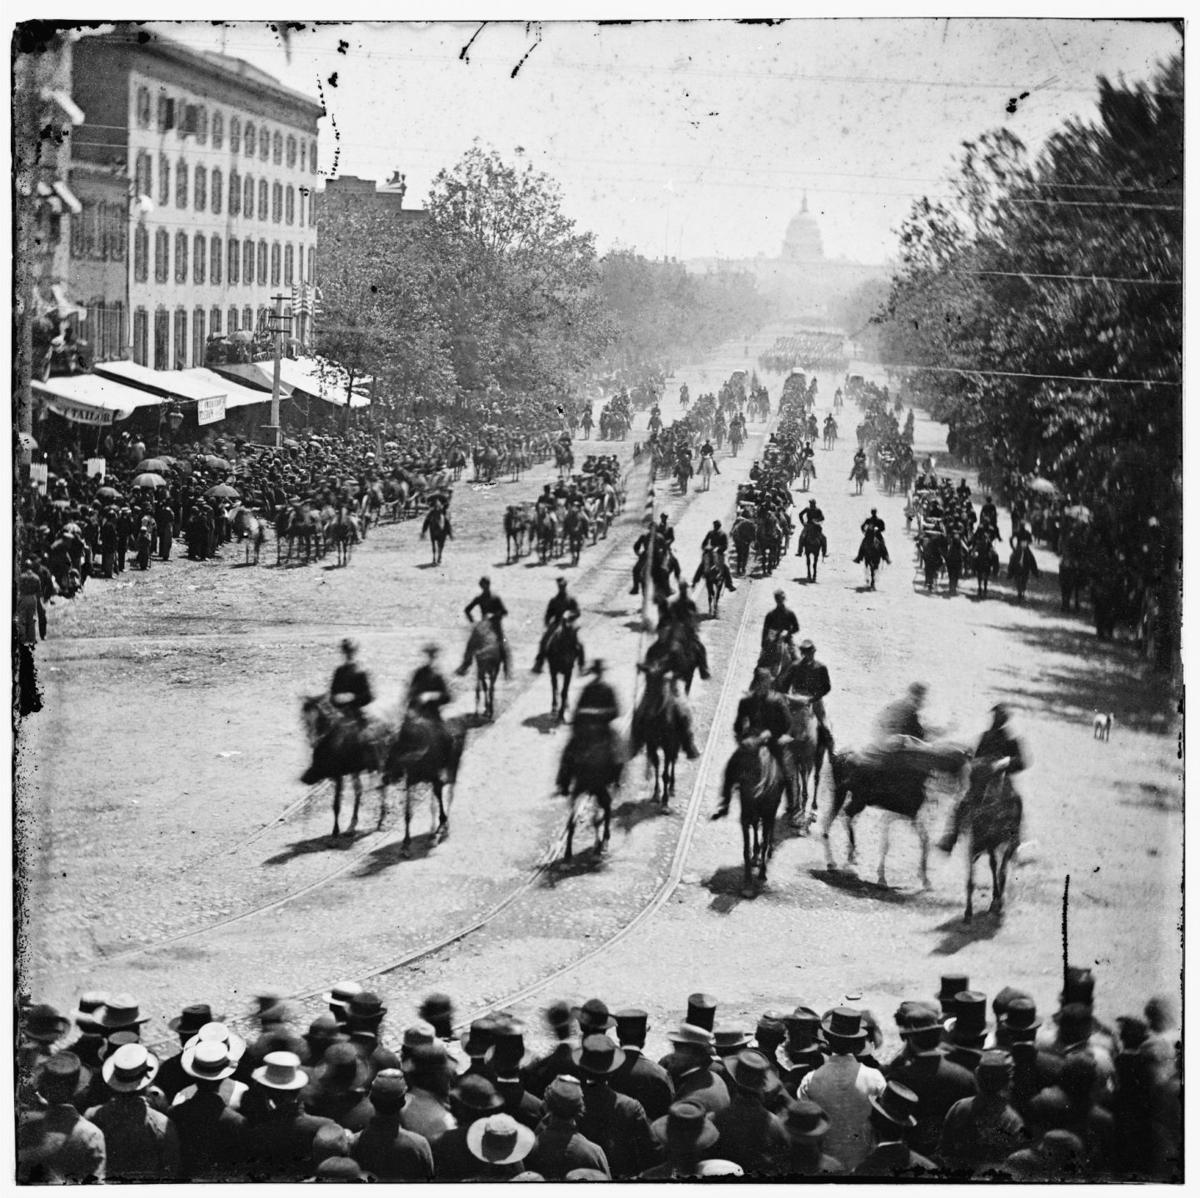 Civil War veterans parade in Washington, D.C., in 1865